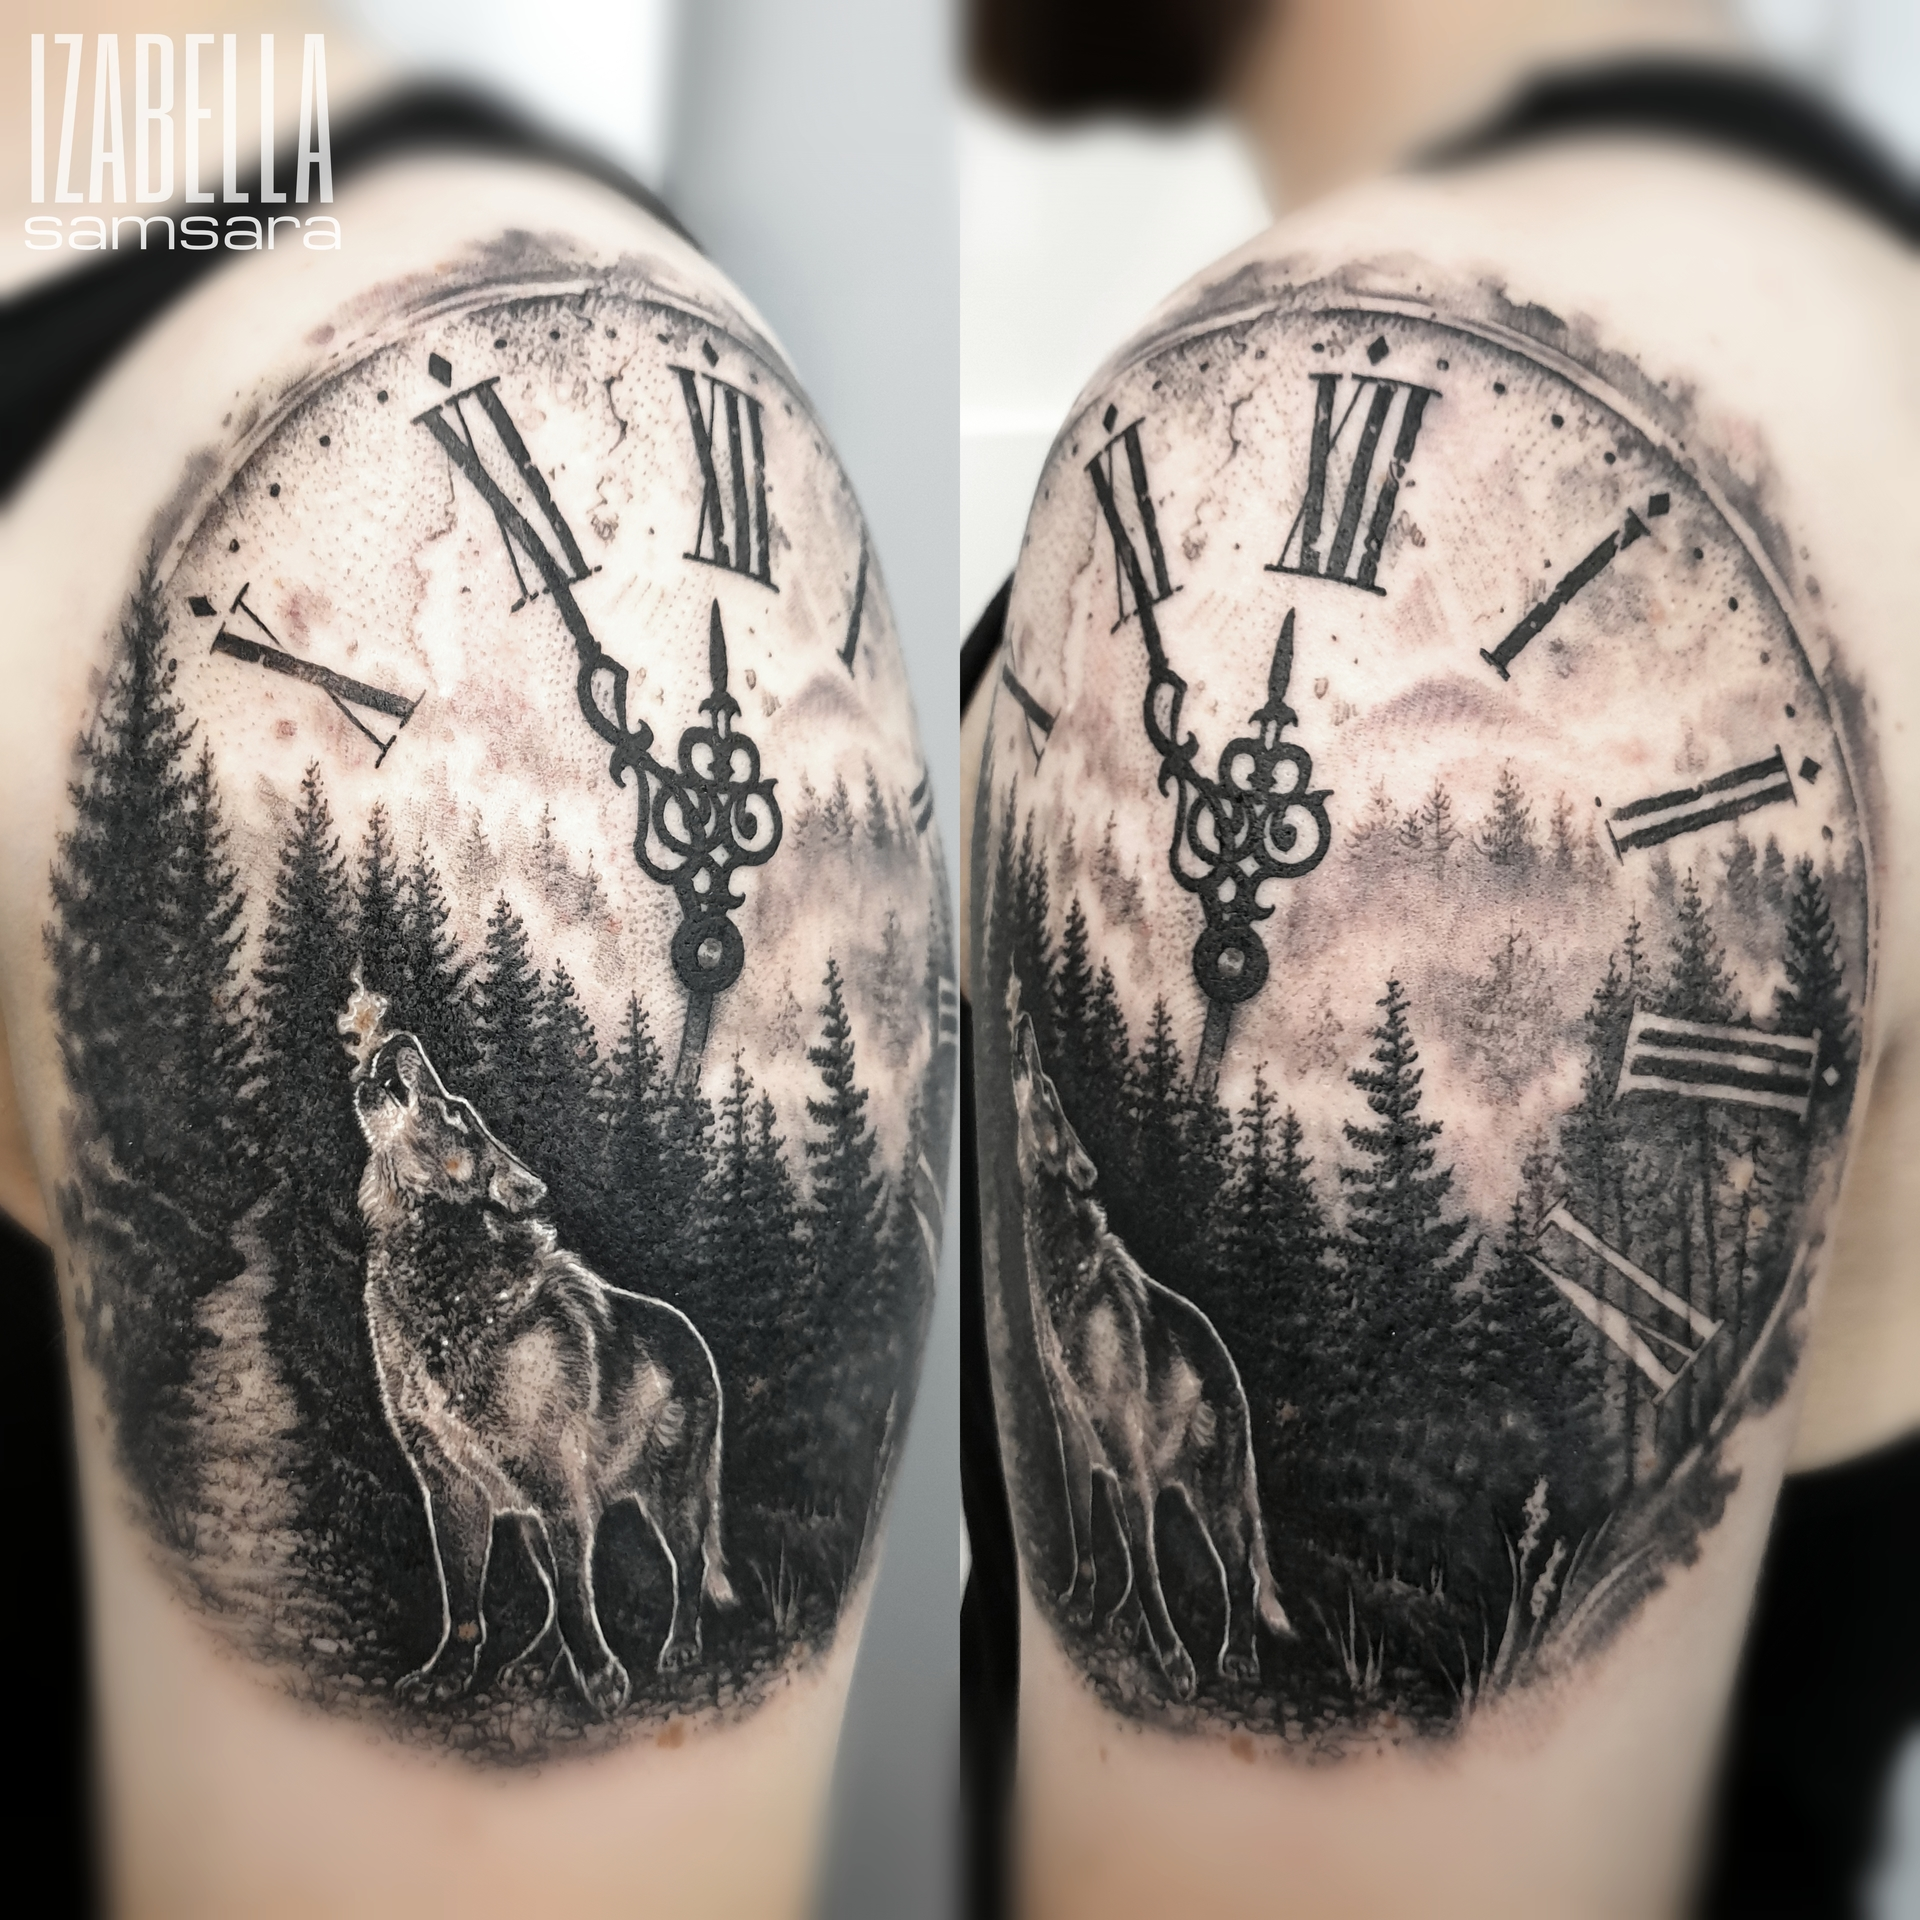 Tatuaże Samsara Tattoo Pracownia Artystyczna Tatuażu